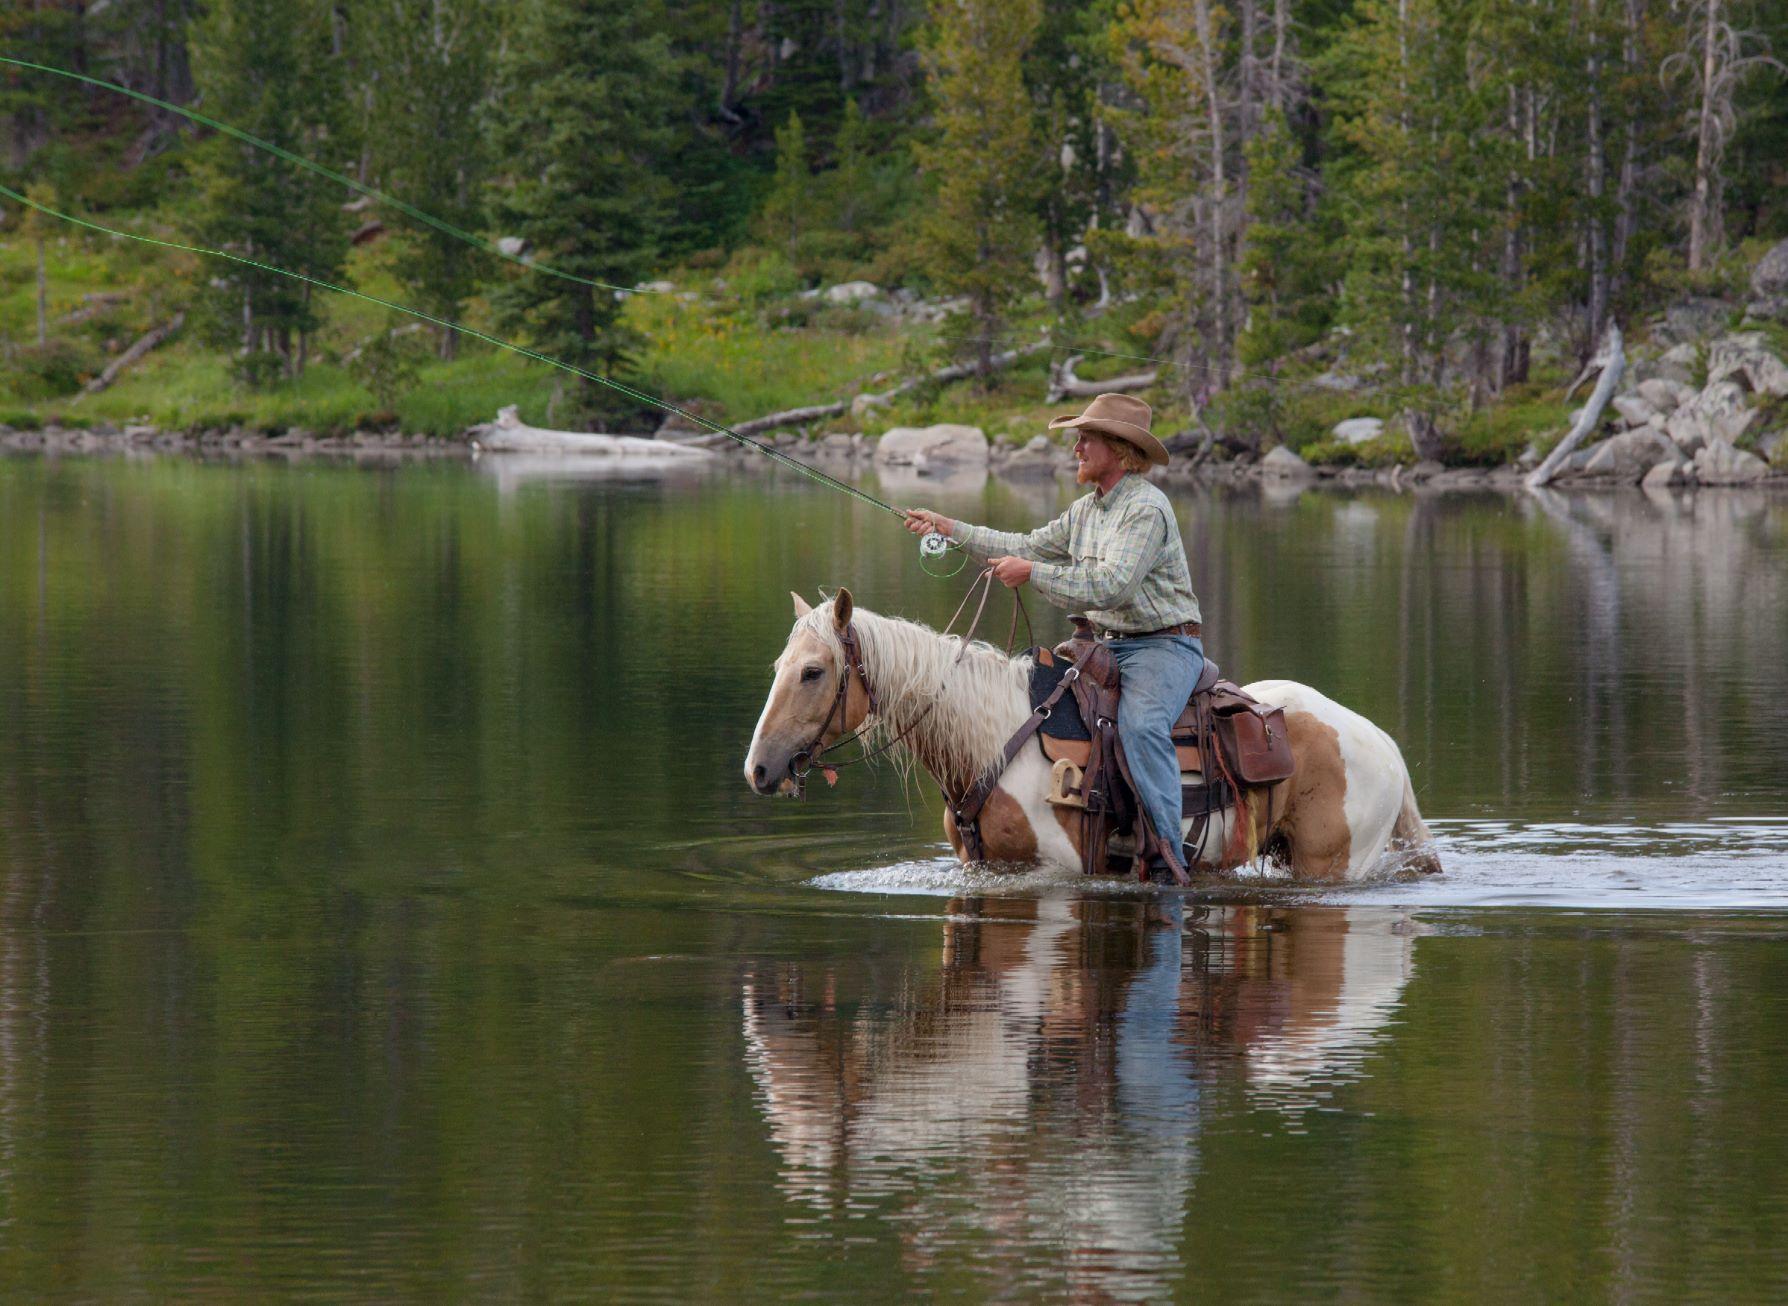 Fly-Fishing Horseback. A questionable idea. Check the blog